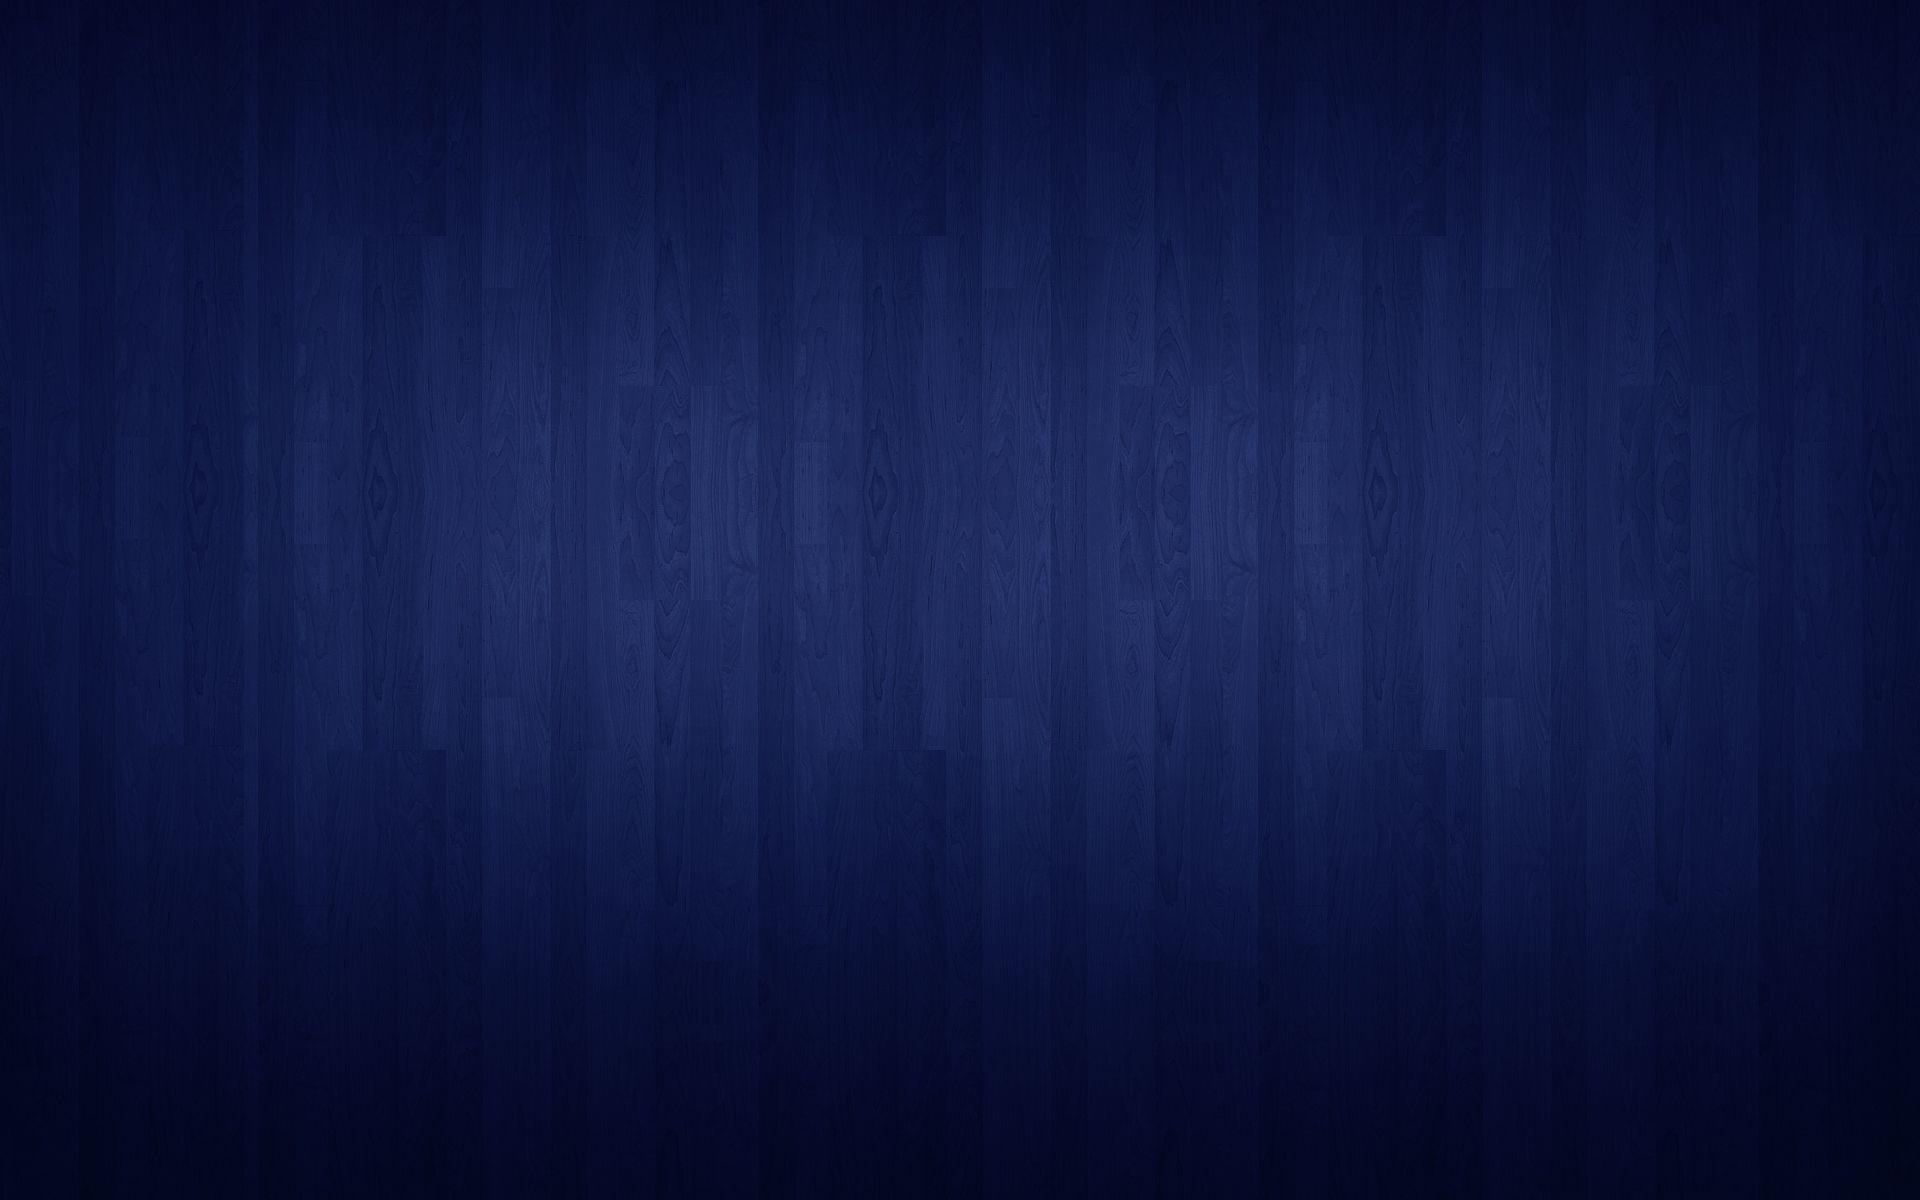 Dark Blue Backgrounds Wallpapers FreeCreatives 1920×1200